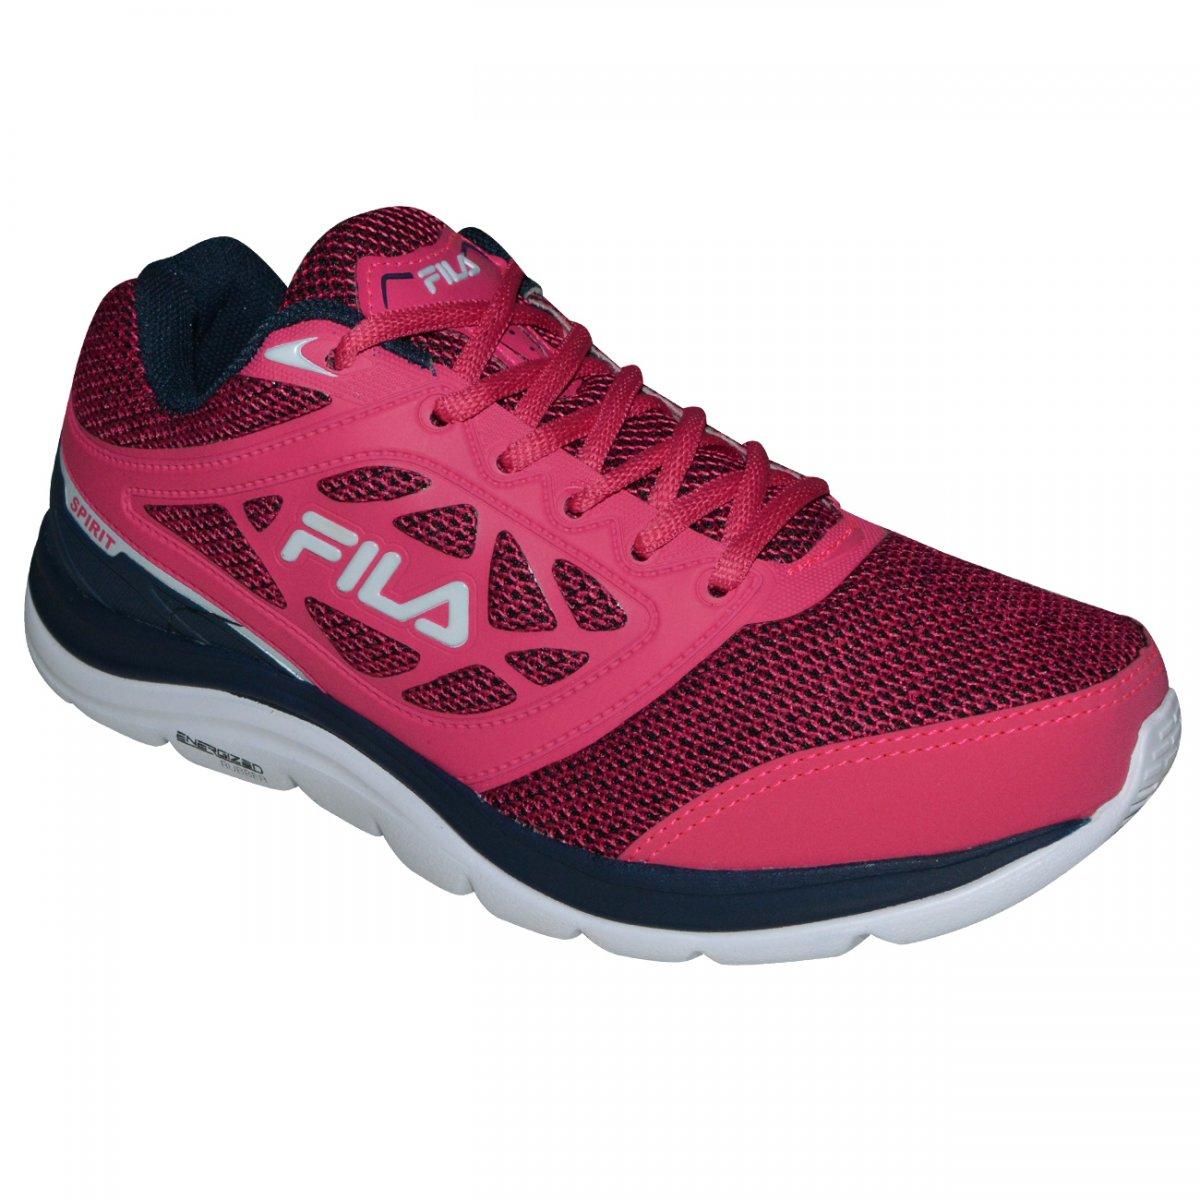 0fcb4c2581 Tenis Fila Spirit 683222 - Rosa marinho - Chuteira Nike